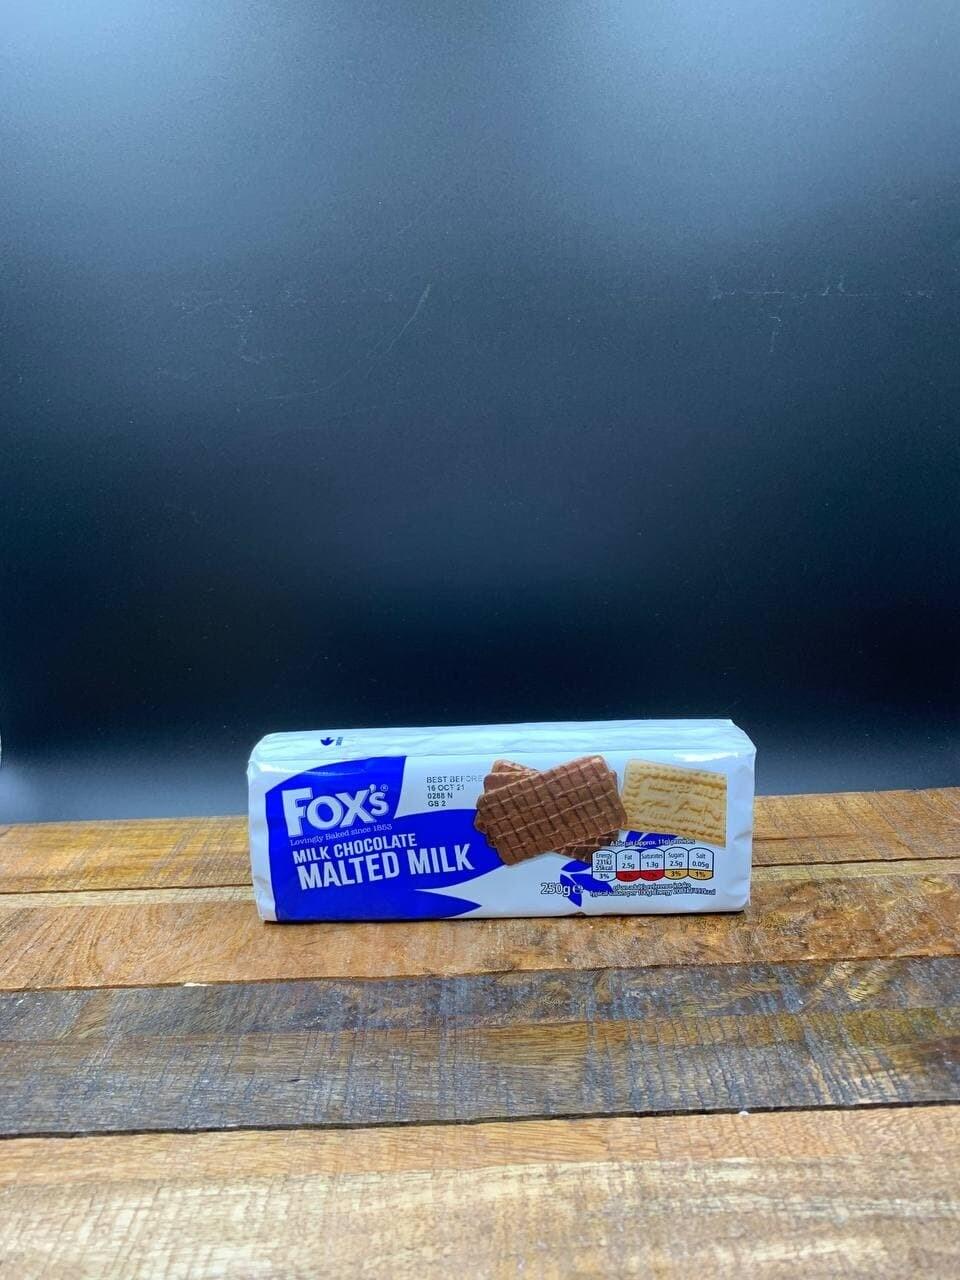 Foxs Milk Chocolate Malted Milk